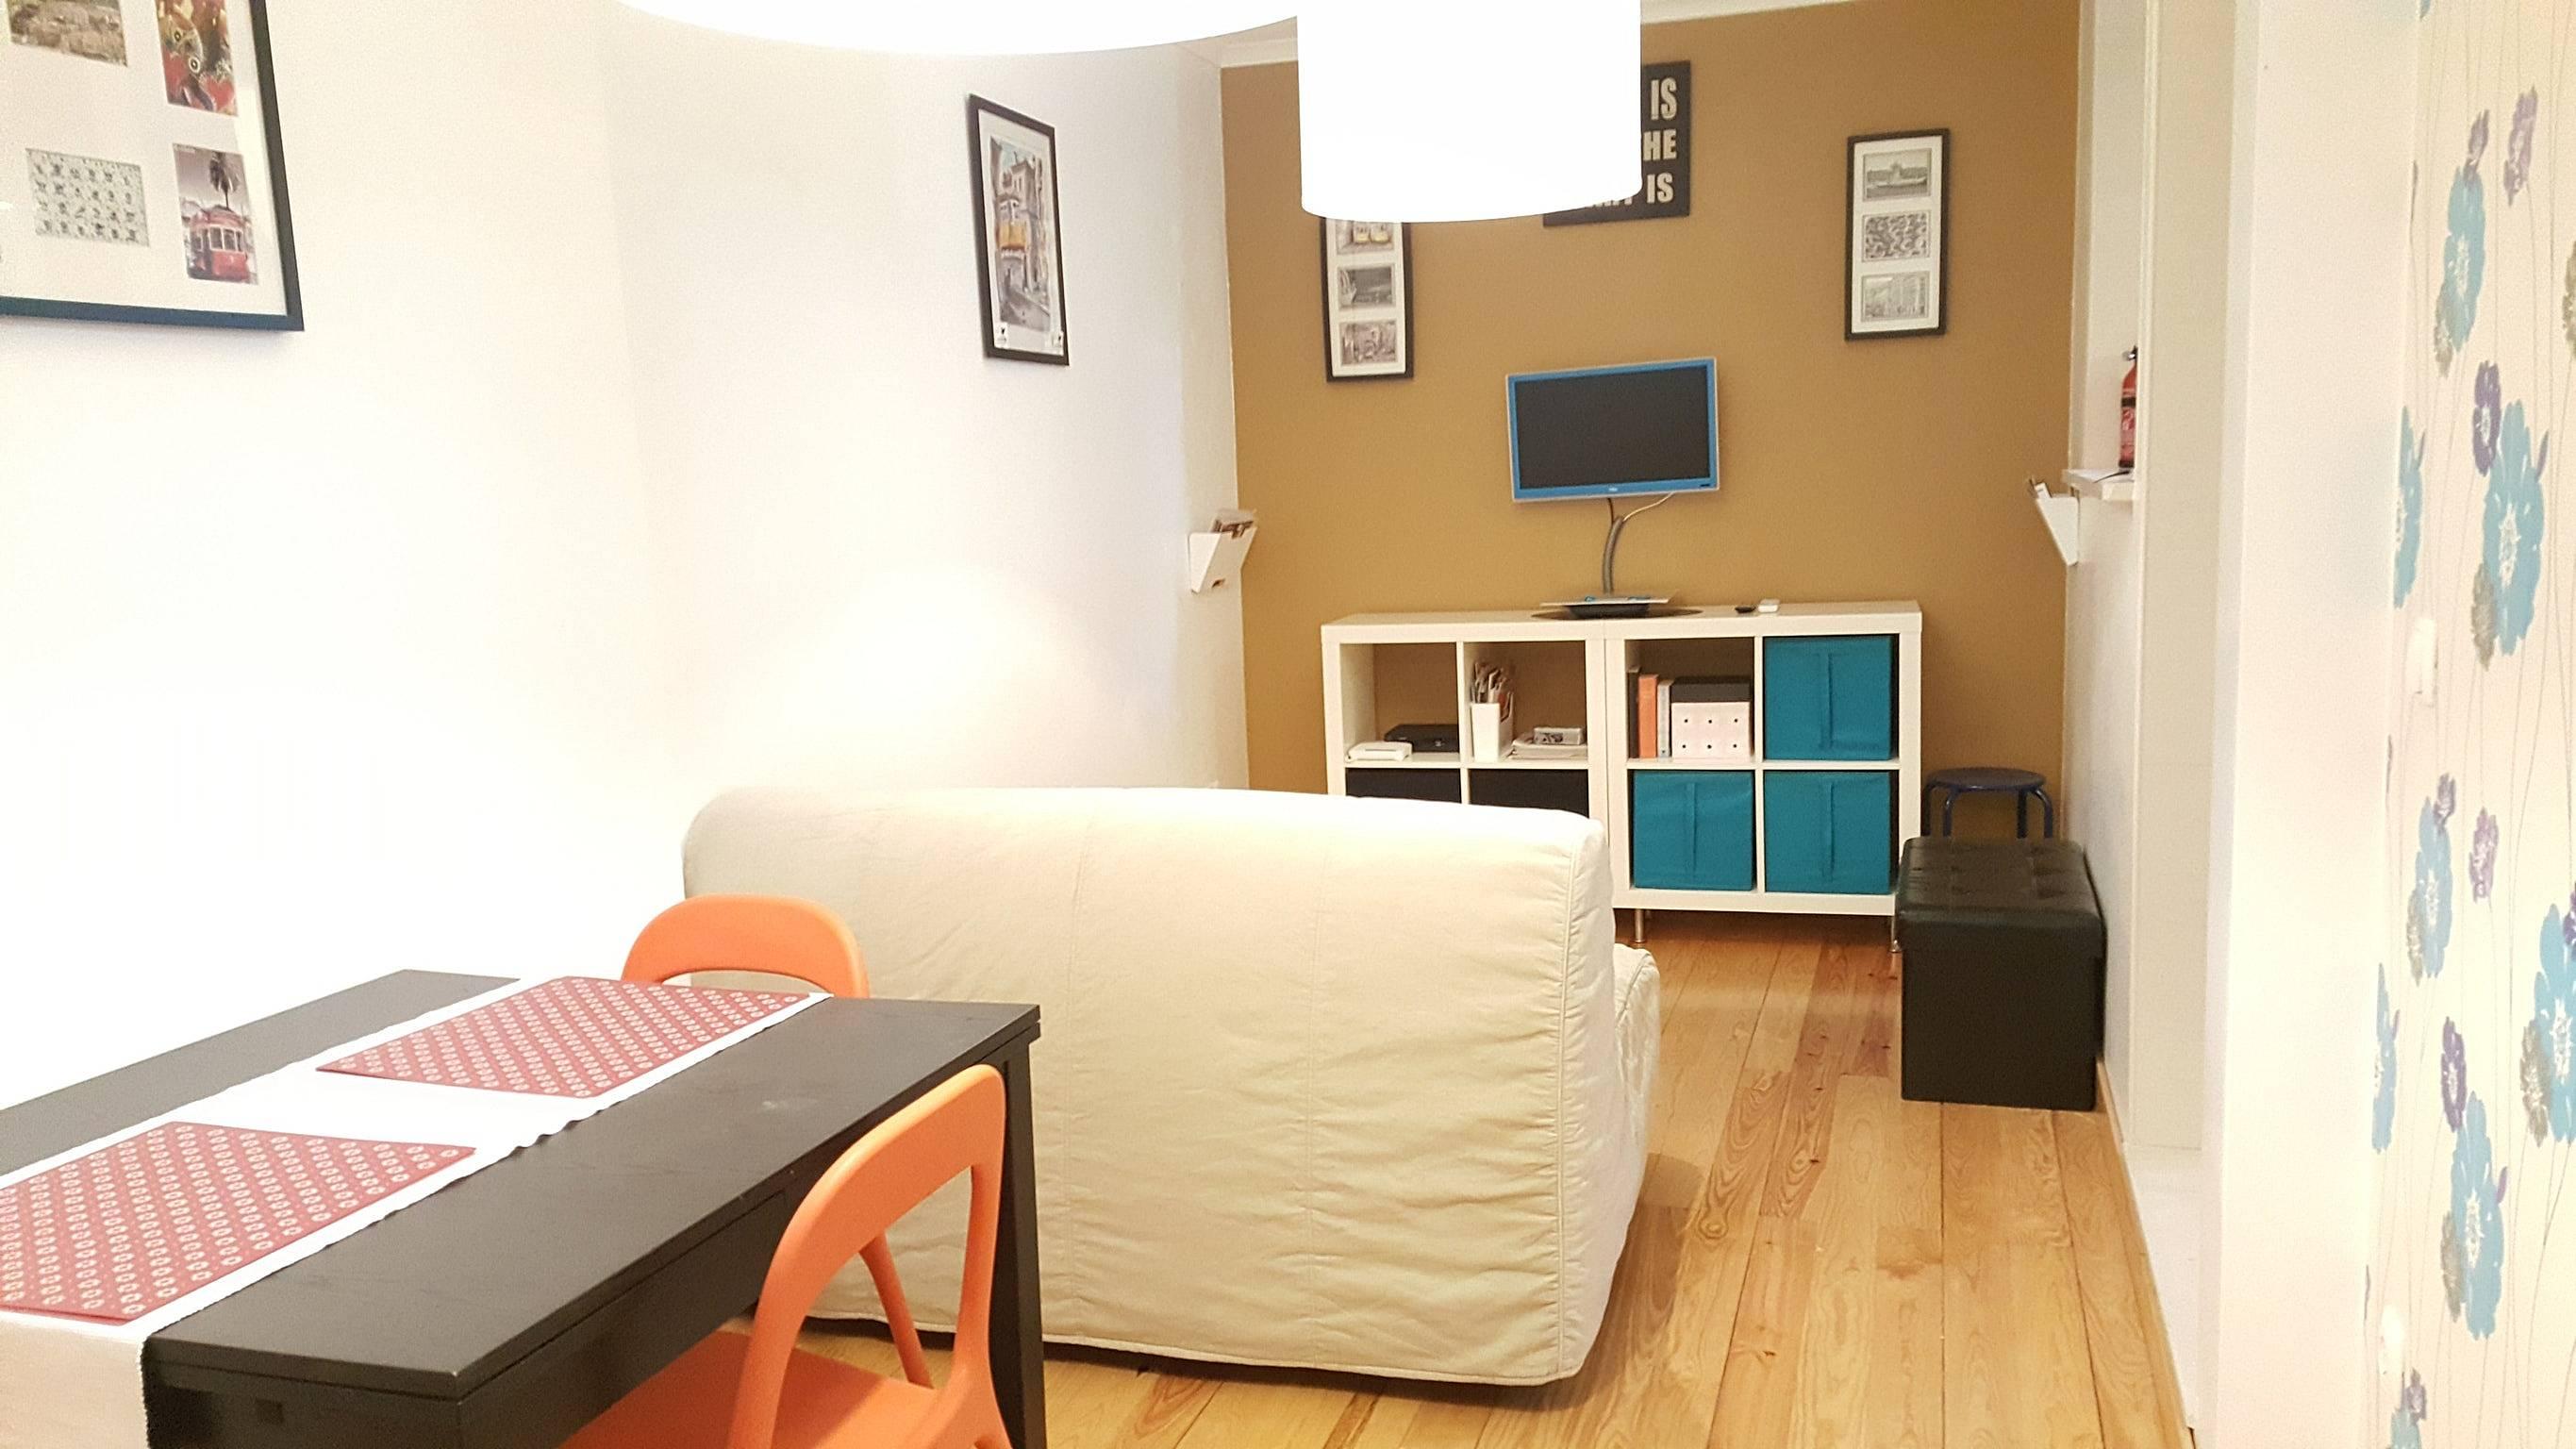 Apartamentos santiago lisboa alquiler apartamentos y pisos tur sticos - Apartamentos en lisboa baratos ...